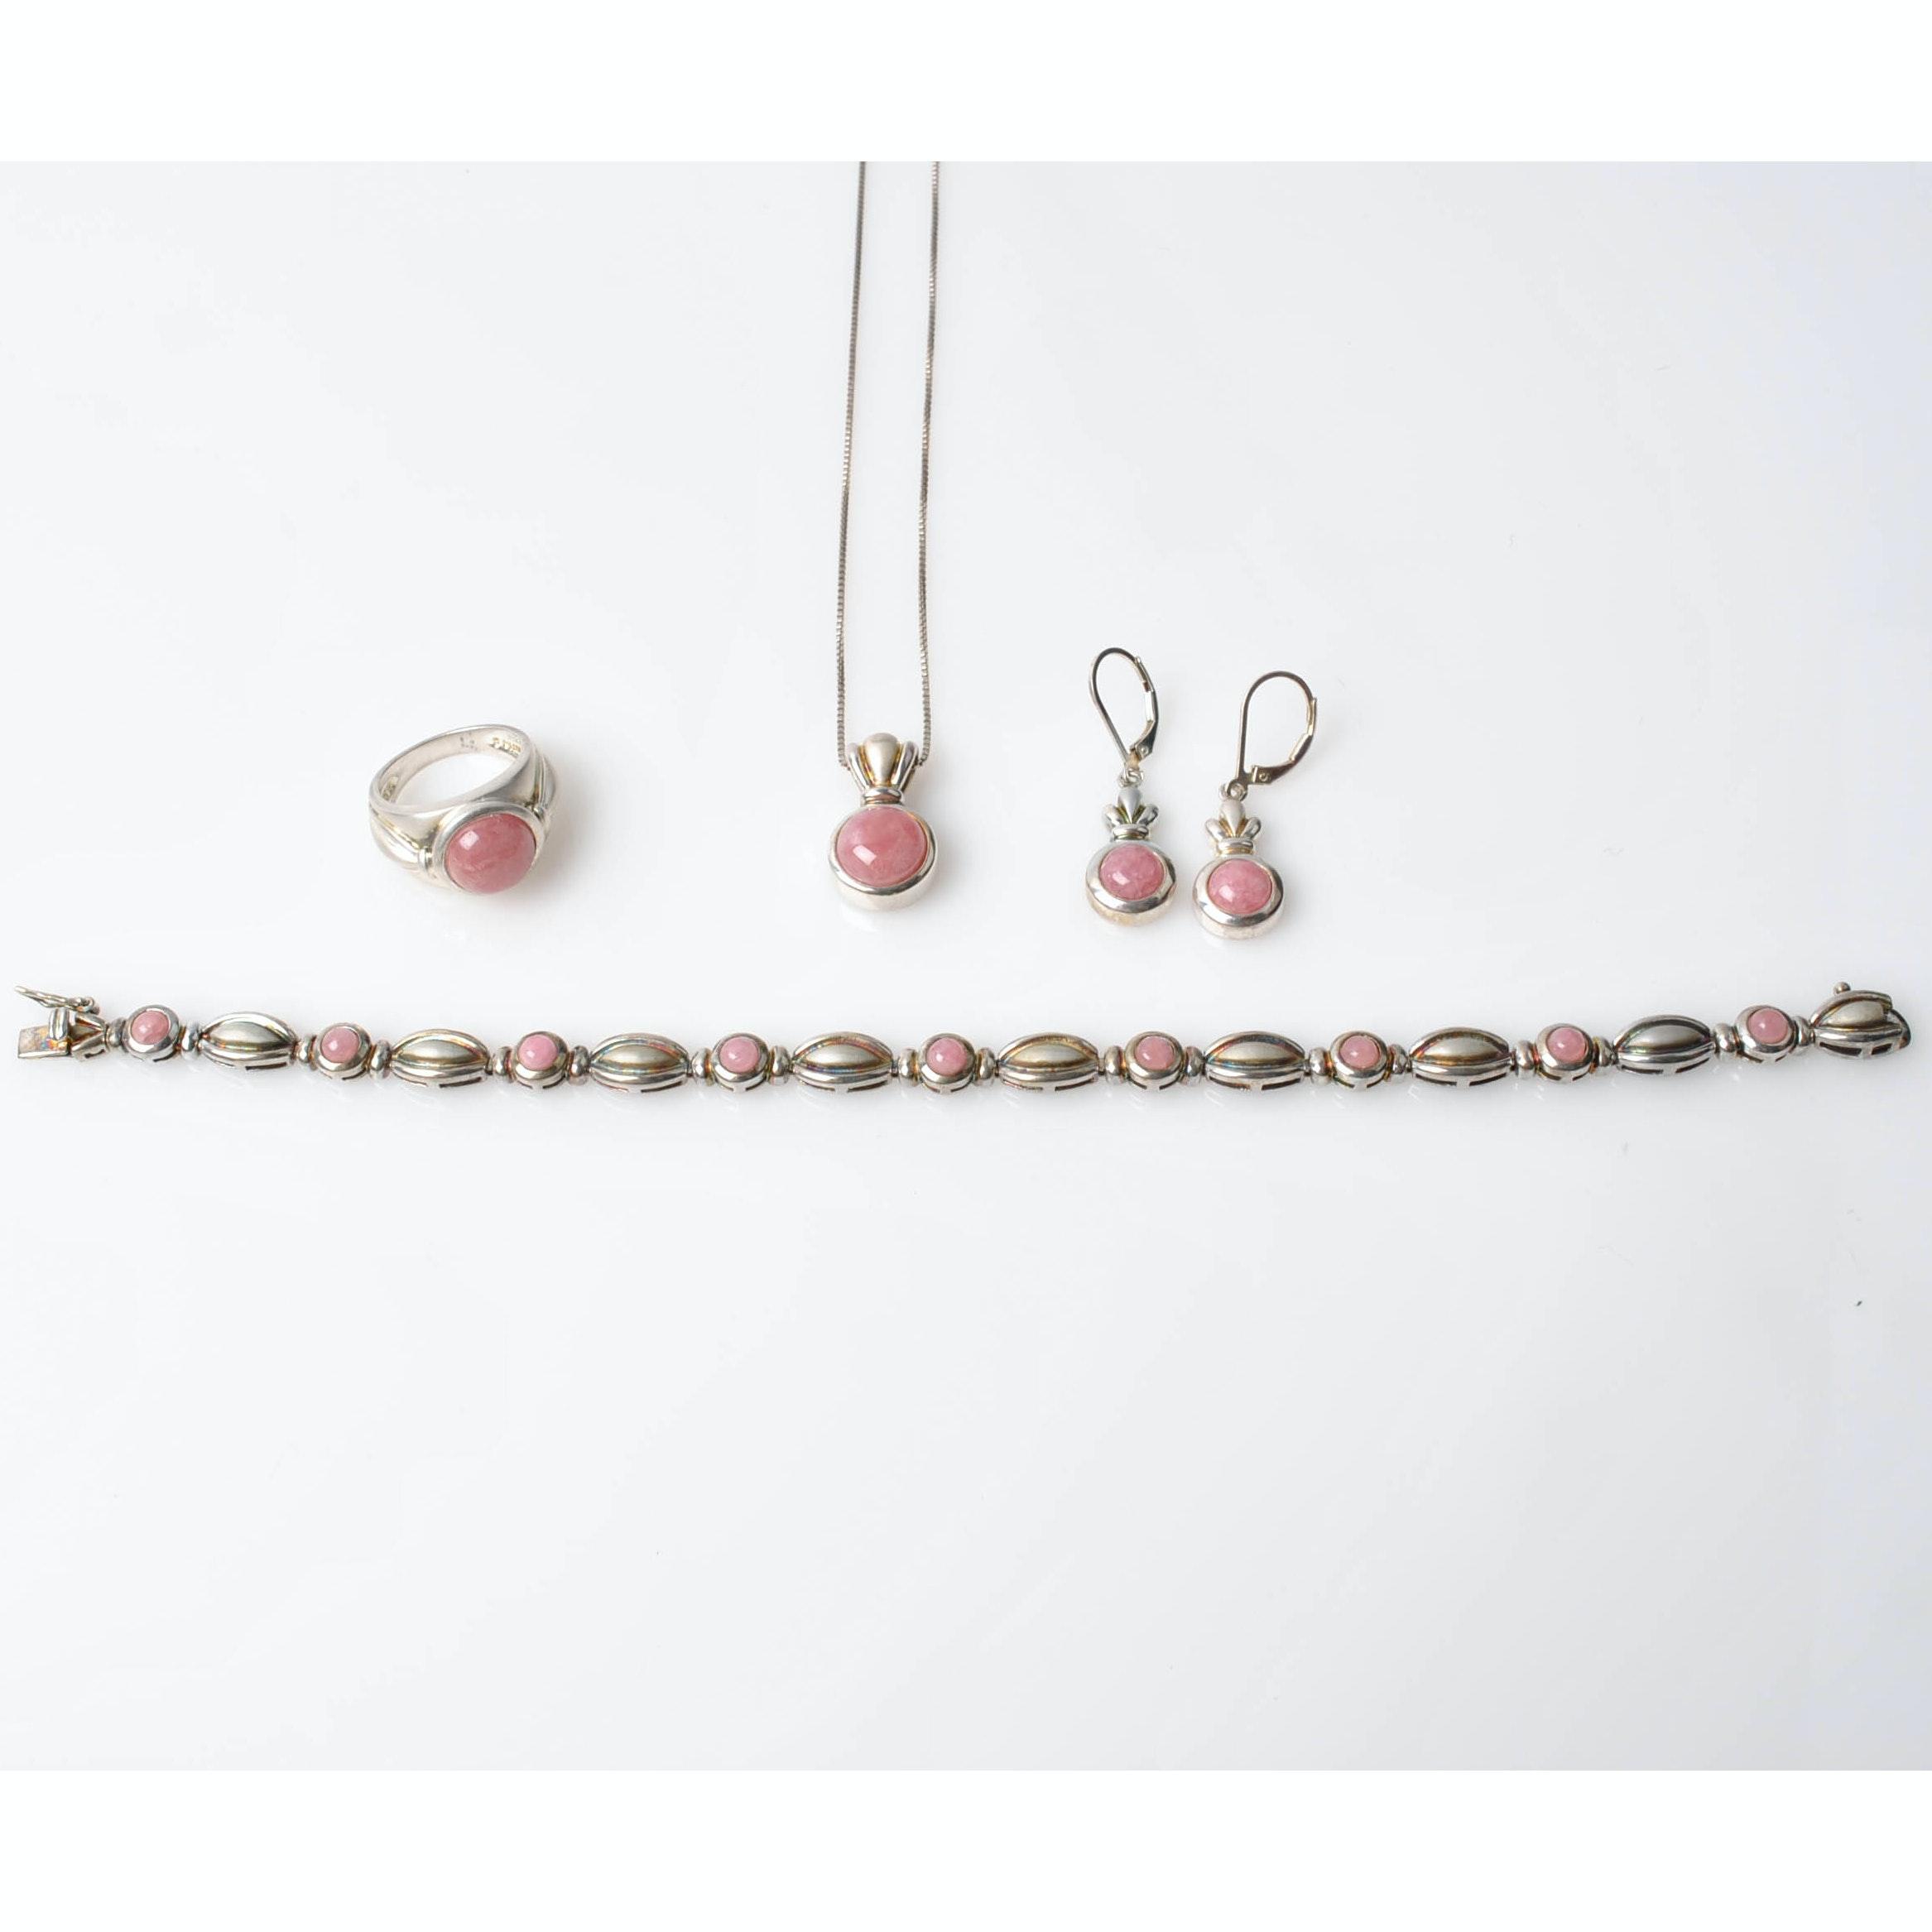 Sterling Silver Rose Quartz Jewelry Set